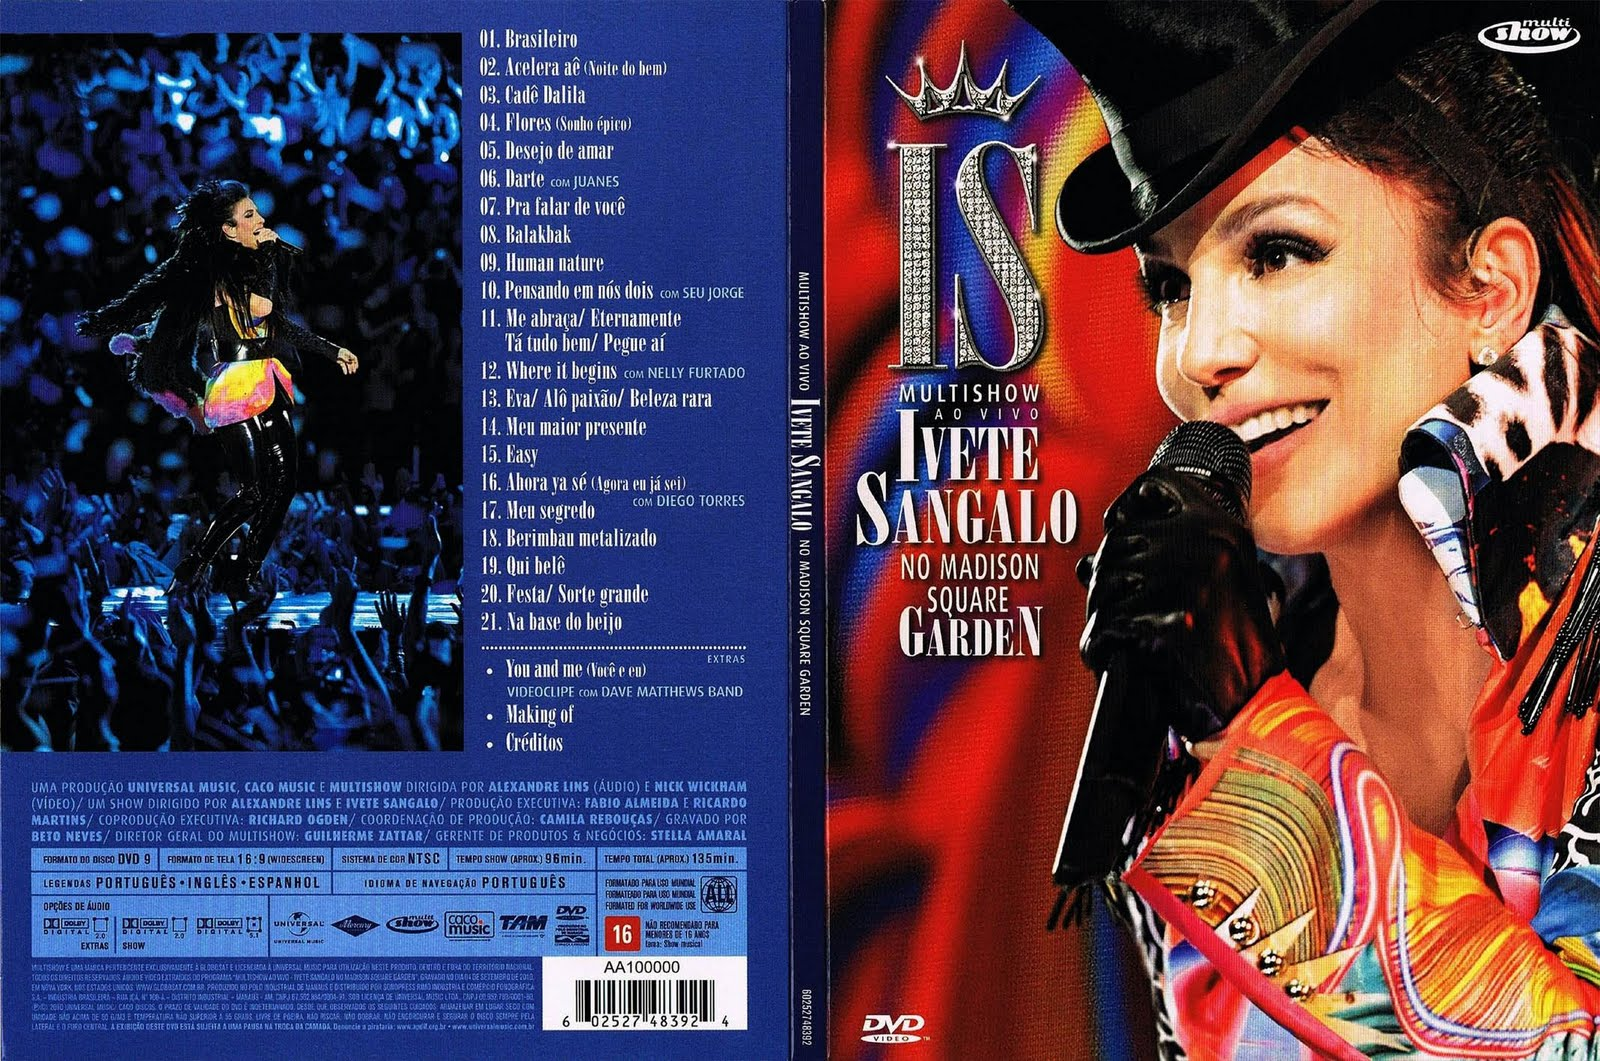 BAIXAR MADISON IVETE CD GARDEN NO SQUARE SANGALO